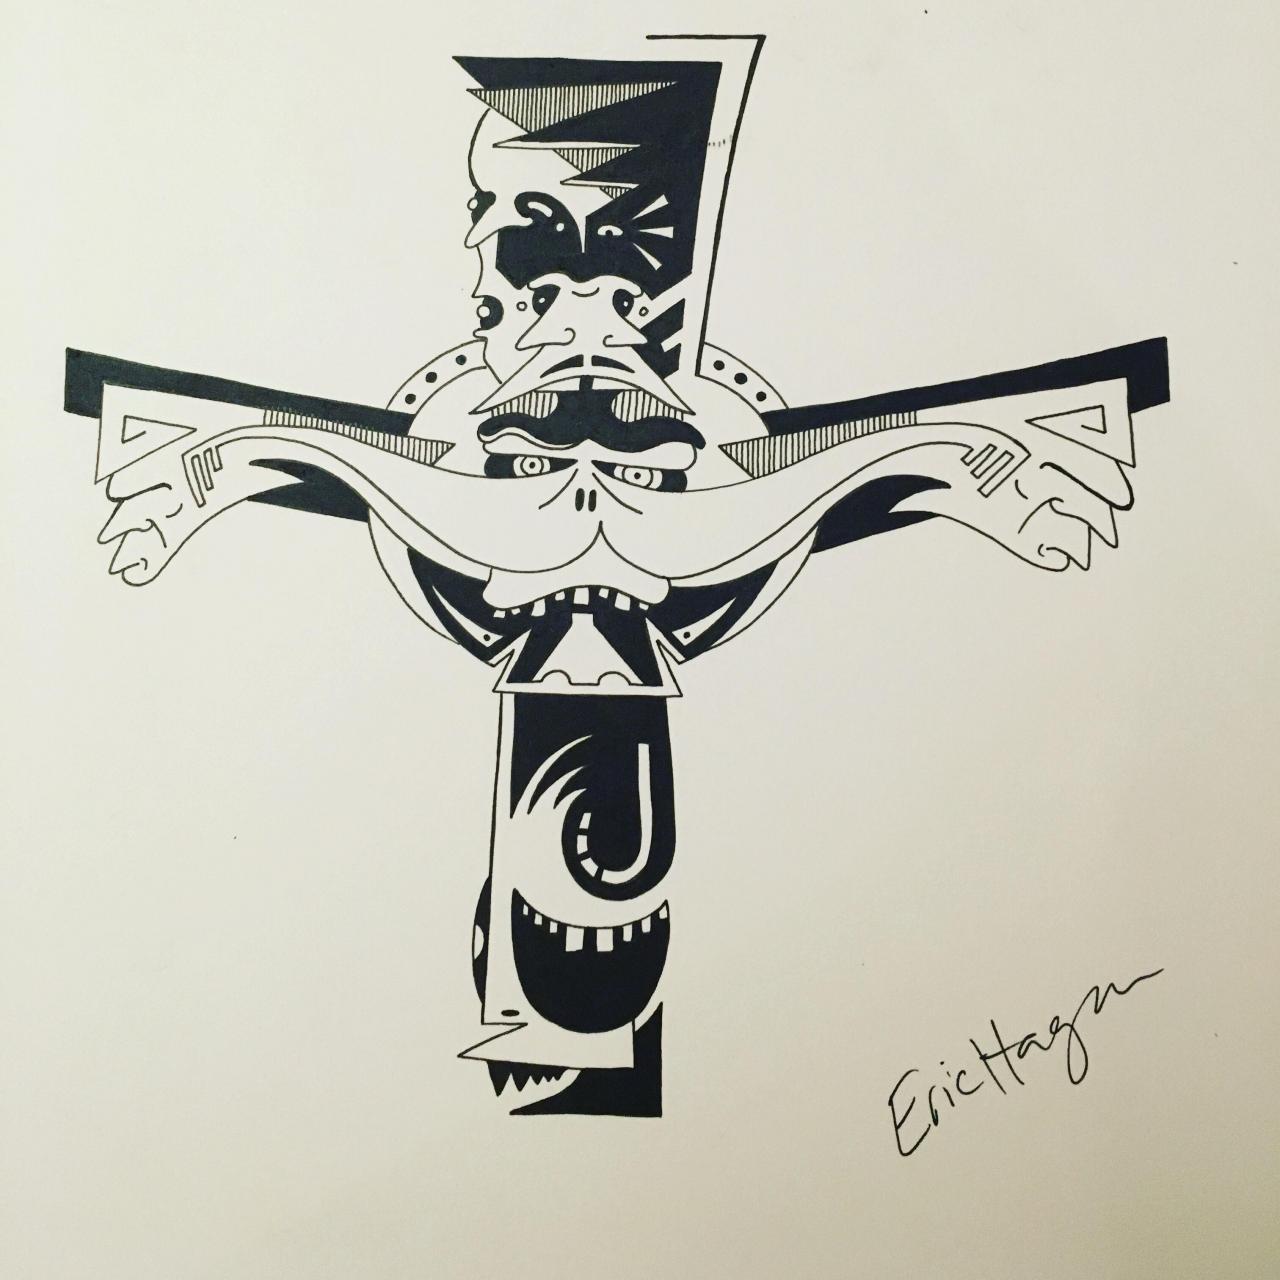 Celtic Cross I just drew for someone